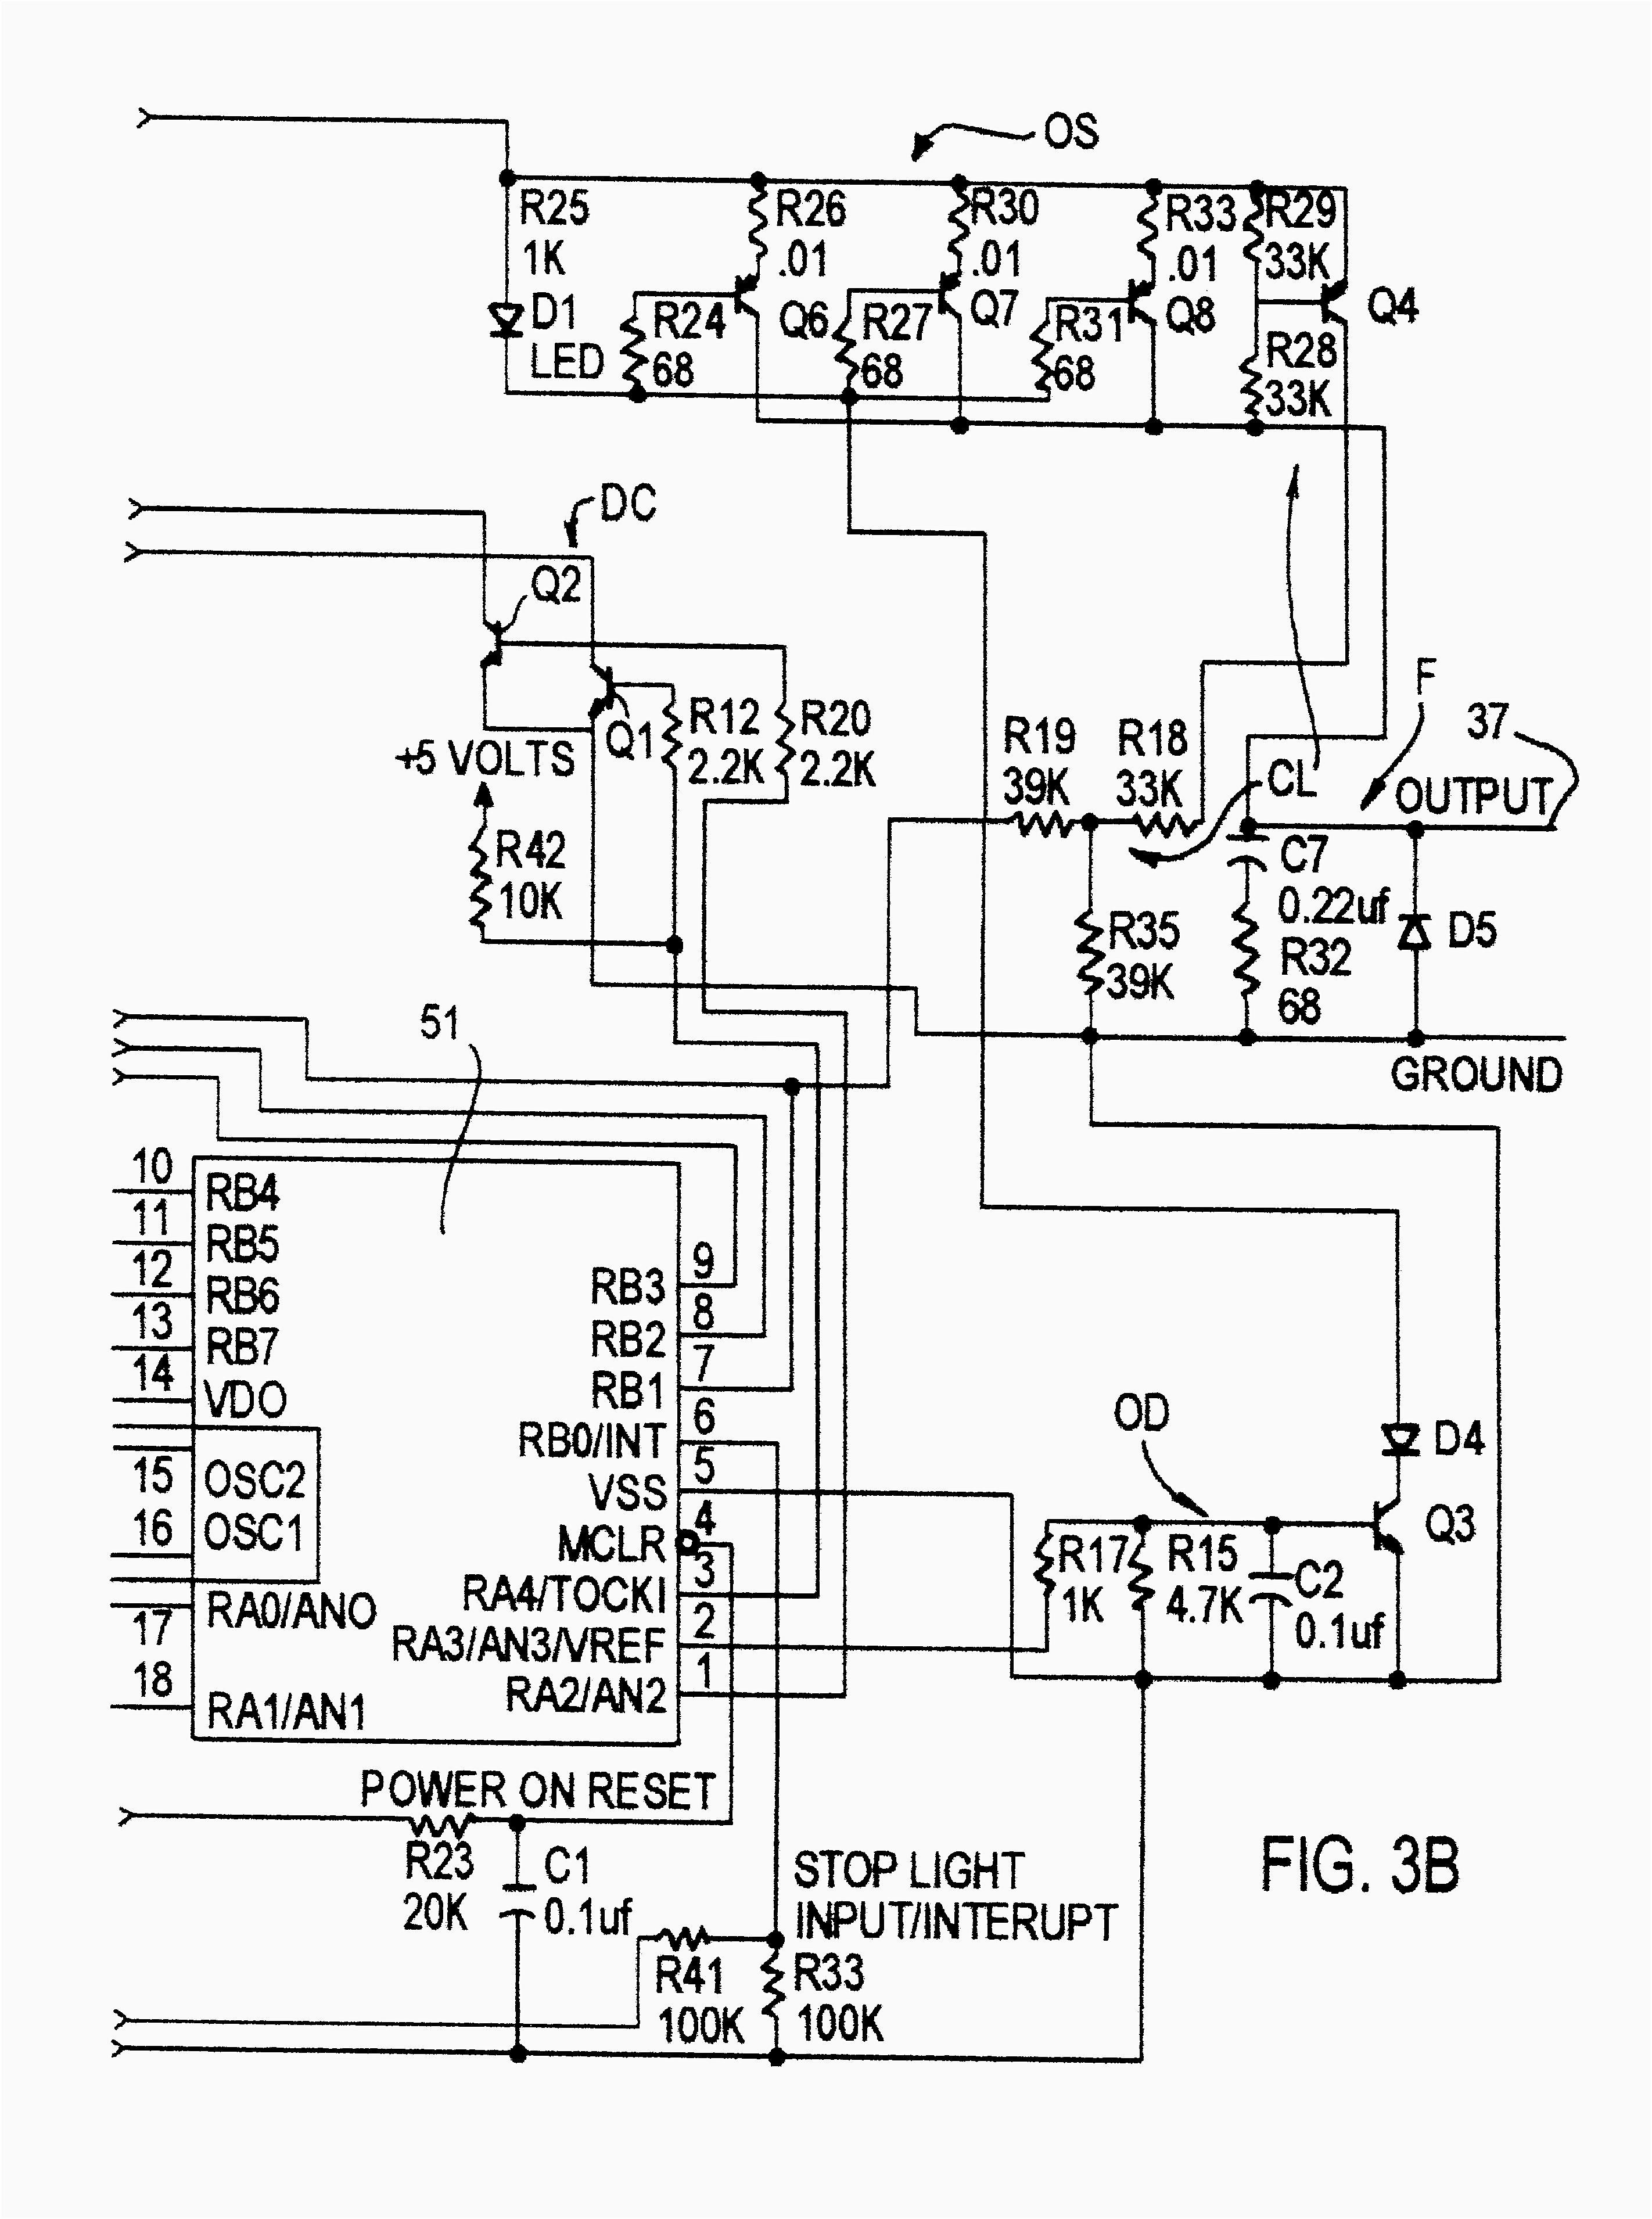 wiring diagram for tekonsha envoy ke controller wiring library Trailer Brake Controller Wiring wiring diagram for tekonsha envoy ke controller wiring library \u2013 hayes brake controller wiring diagram